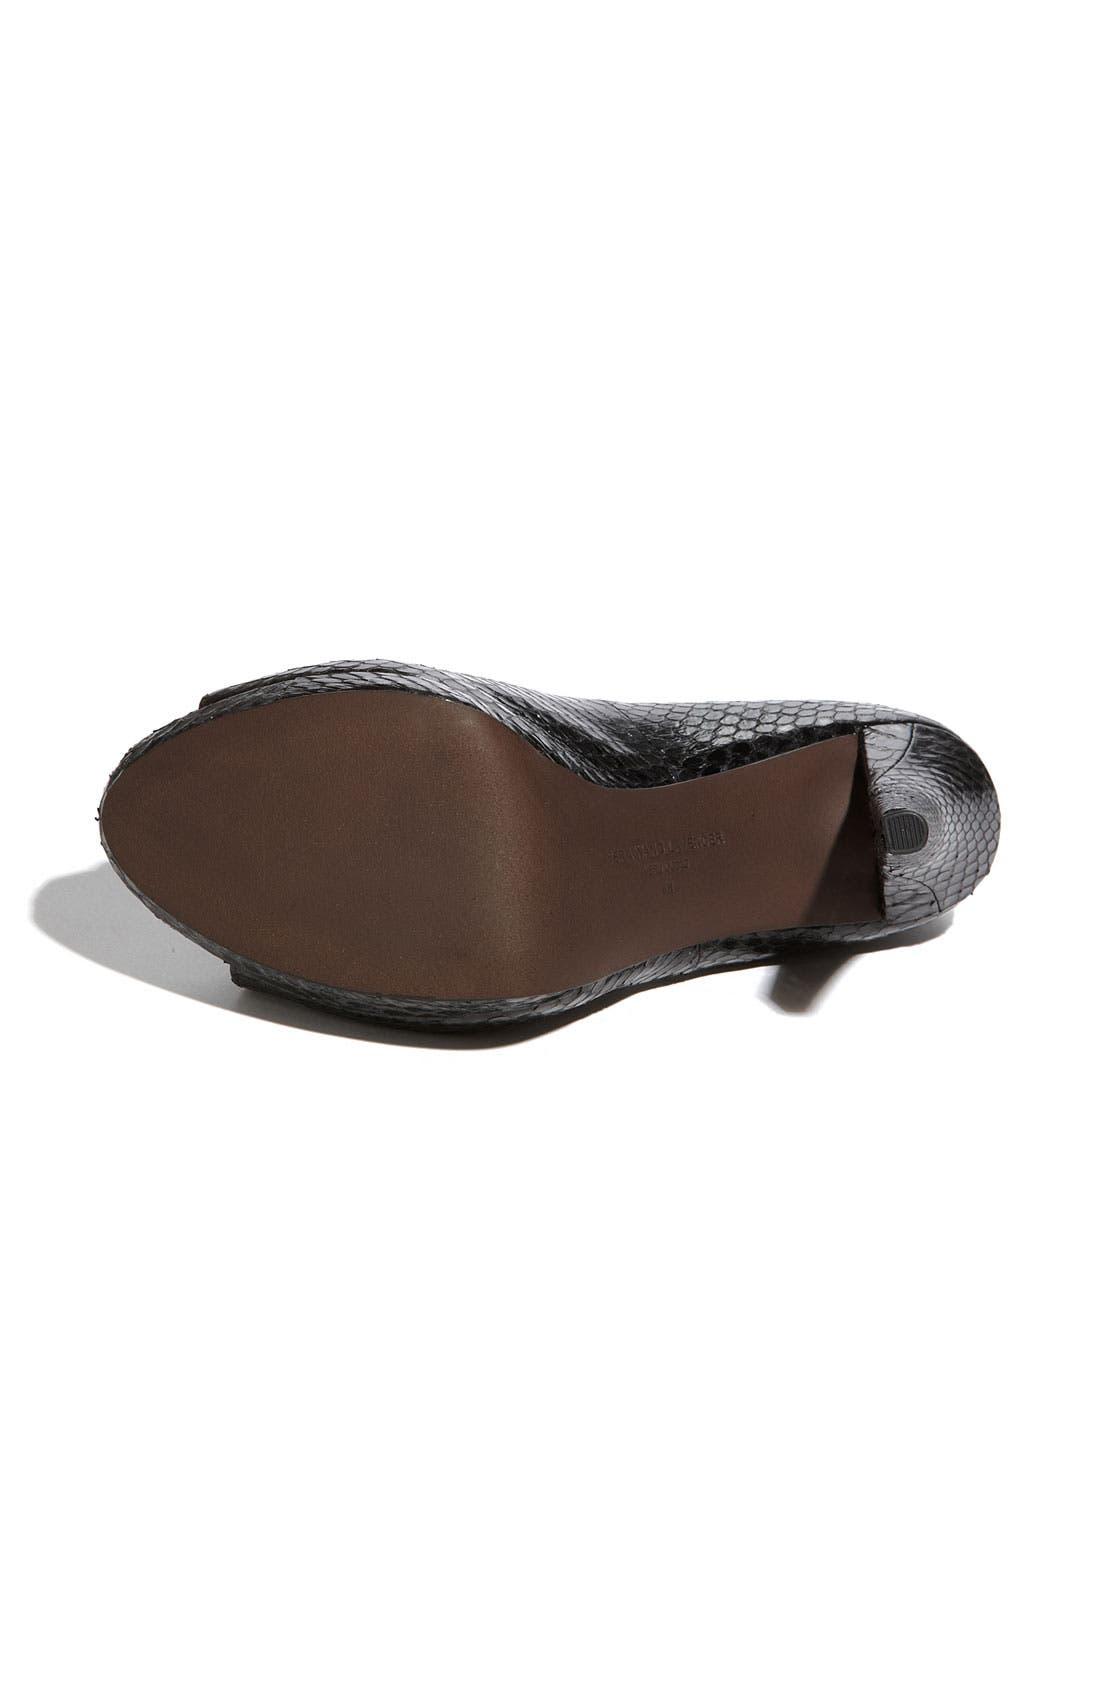 Footwear 'Selima' Peep Toe Pump,                             Alternate thumbnail 7, color,